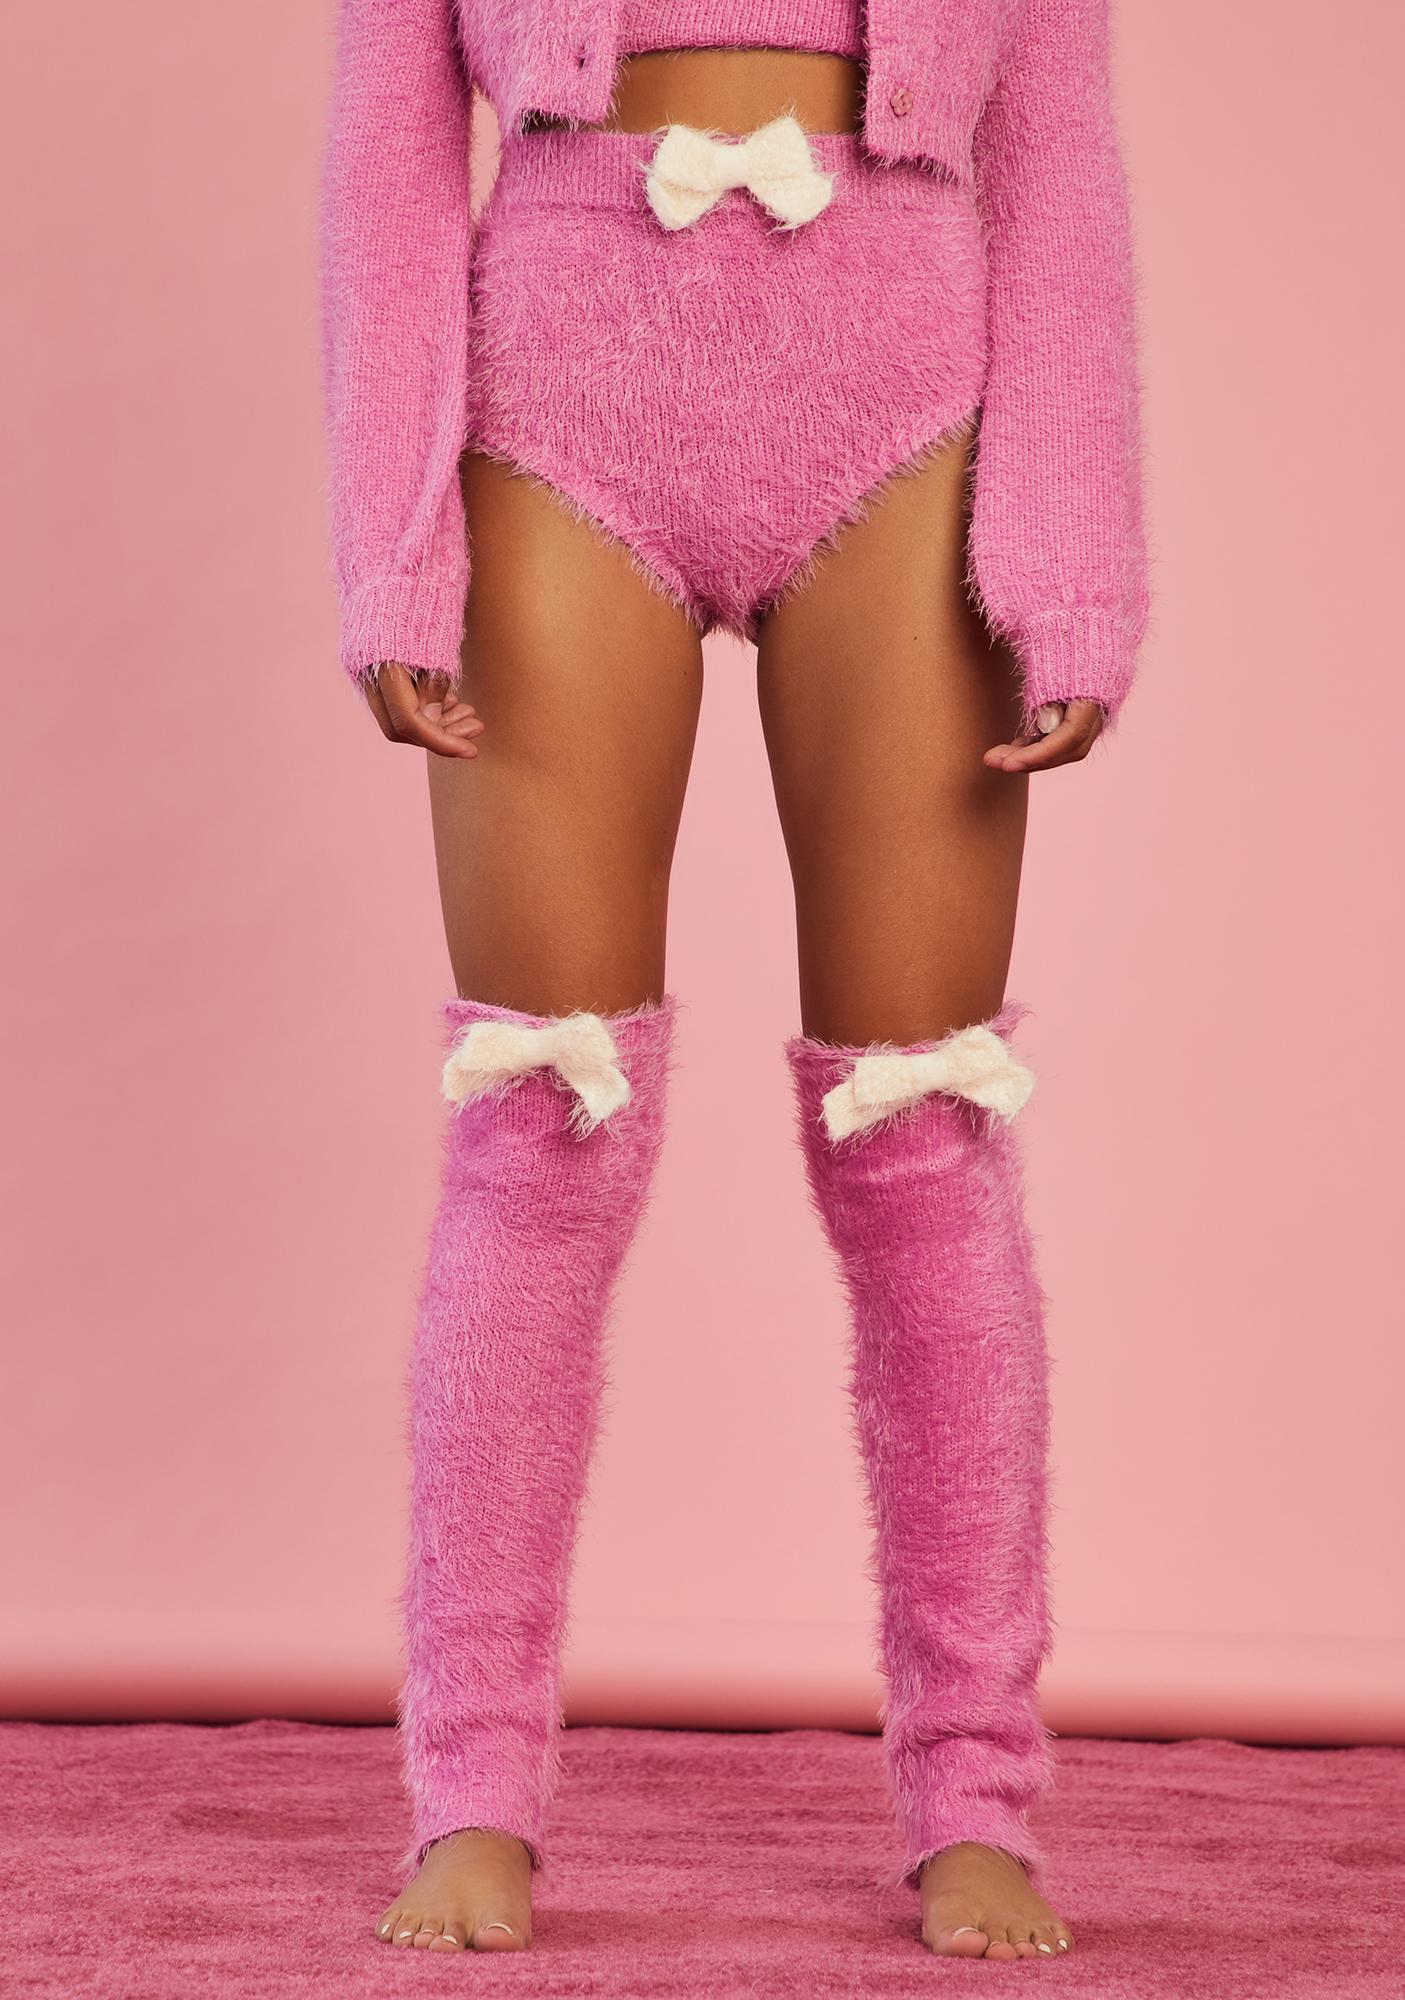 Sugar Thrillz Serenity Calls Fuzzy Shorts And Leg Warmers